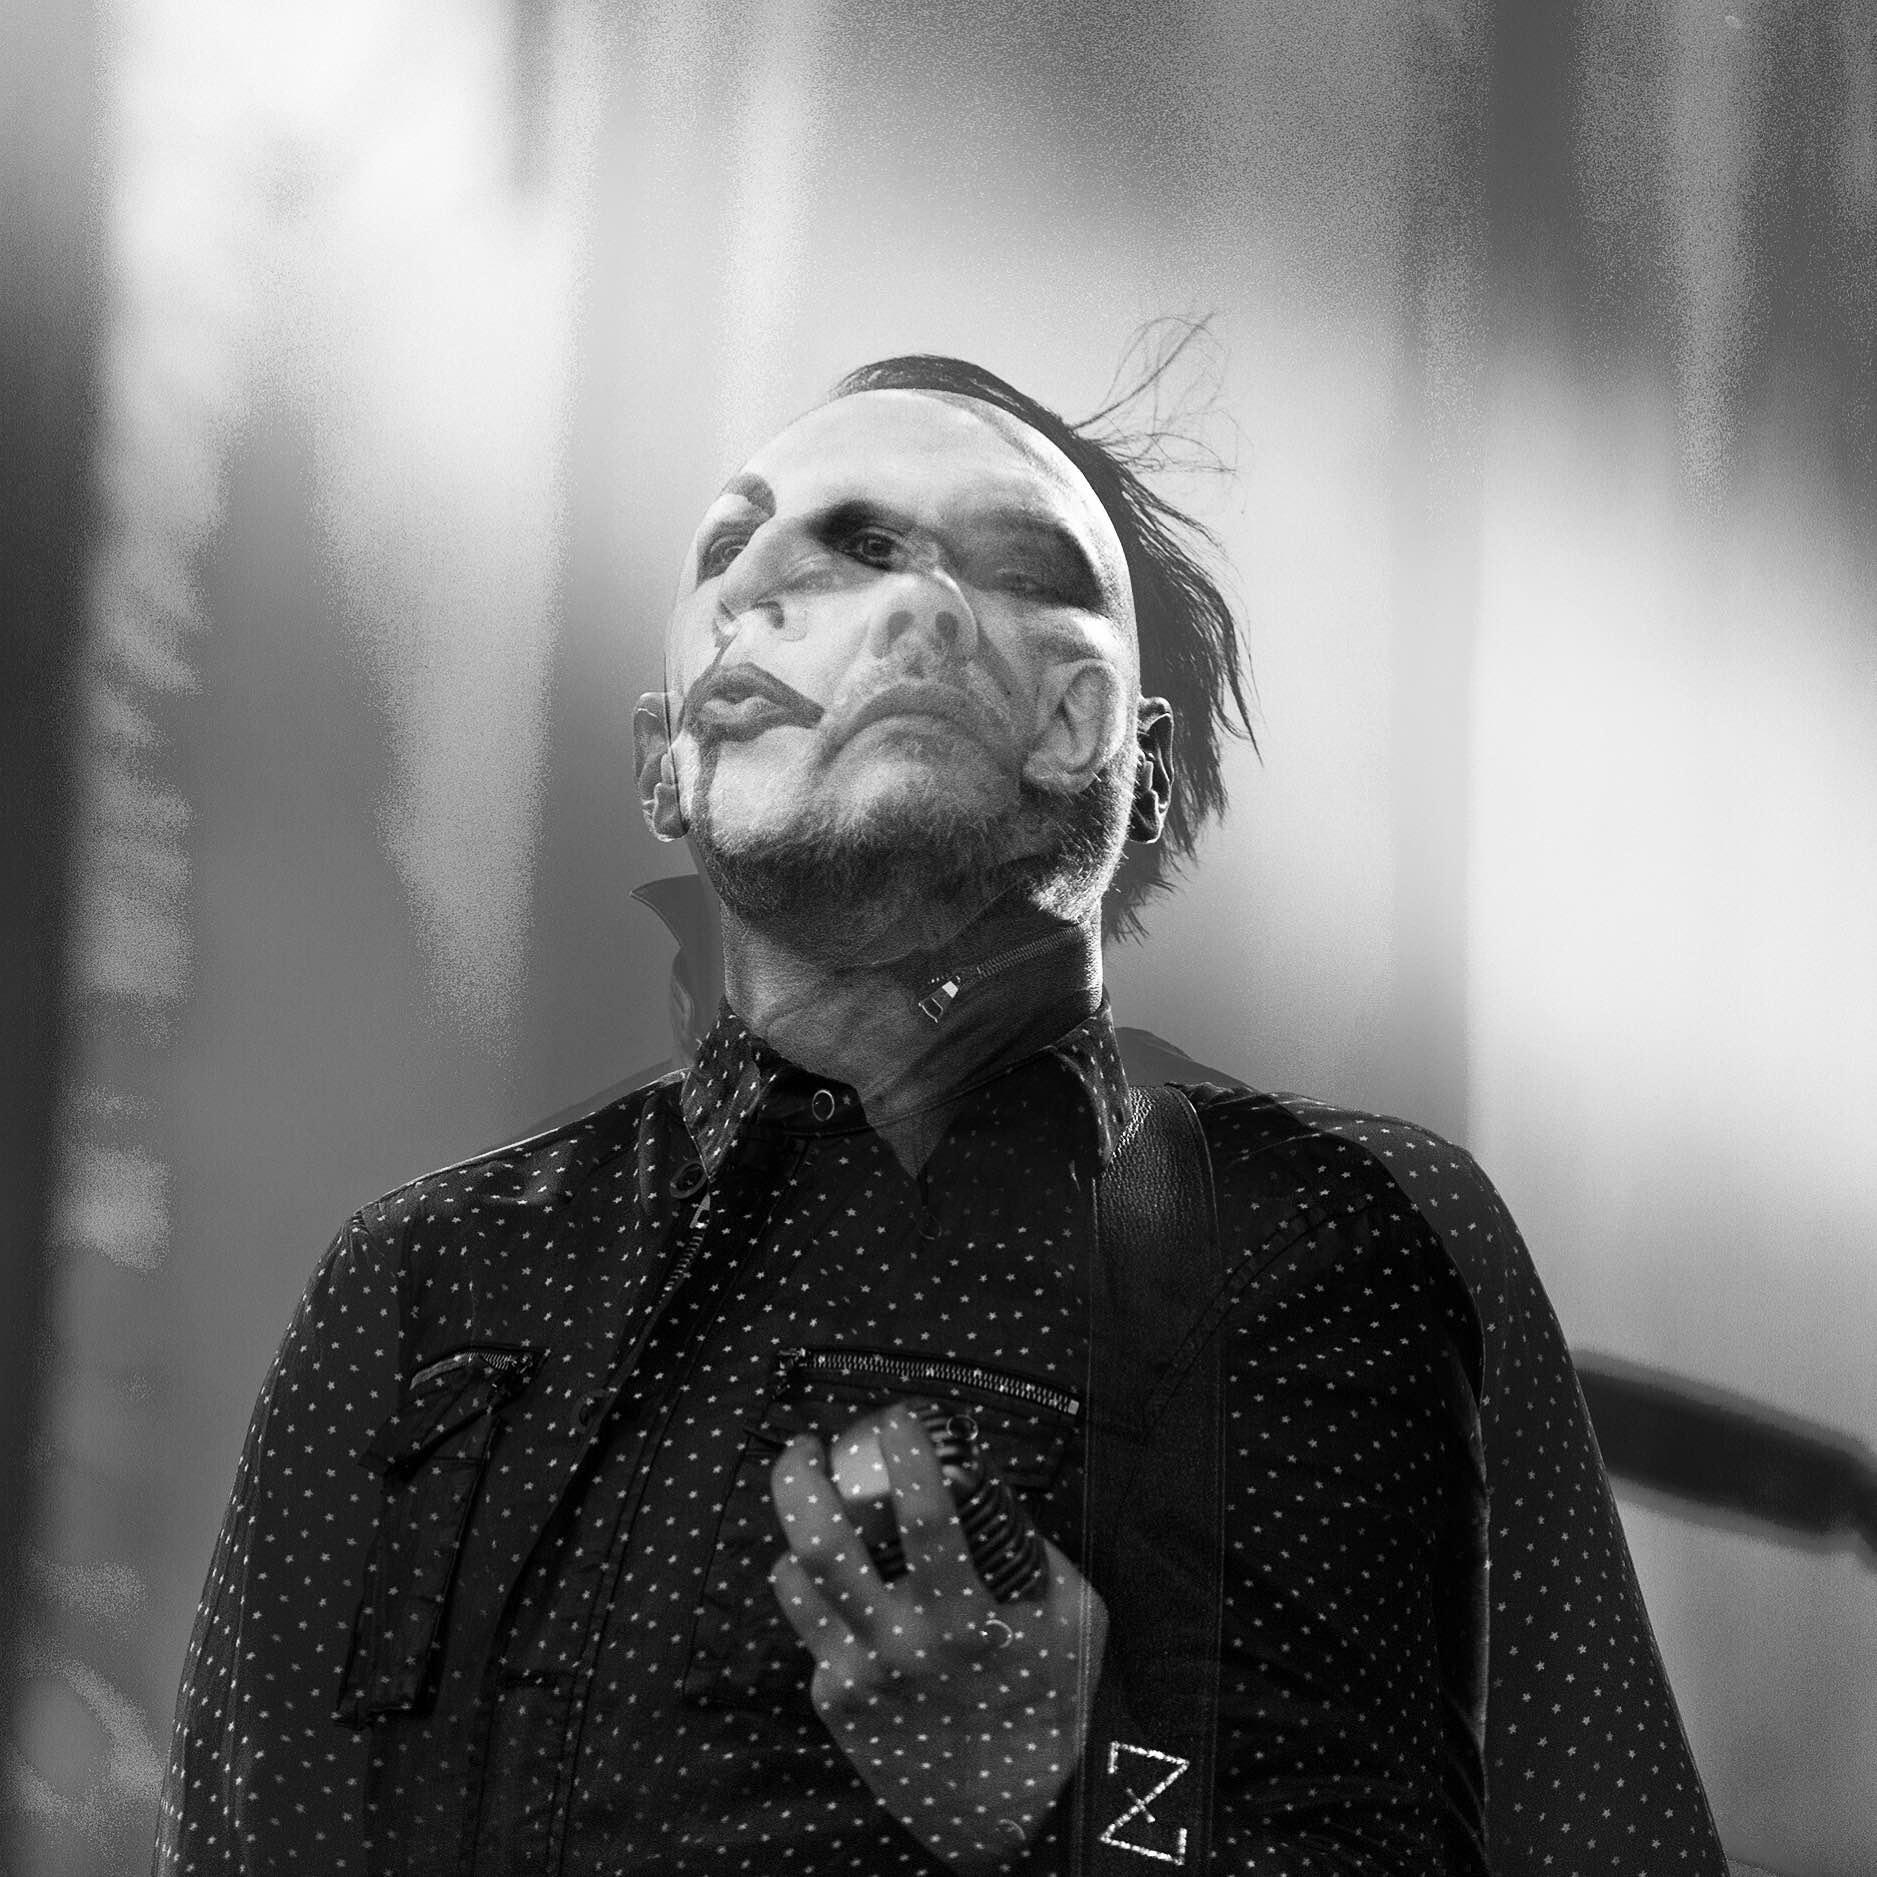 Billy Corgan of The Smashing Pumpkins and Marilyn Manson, 2015.